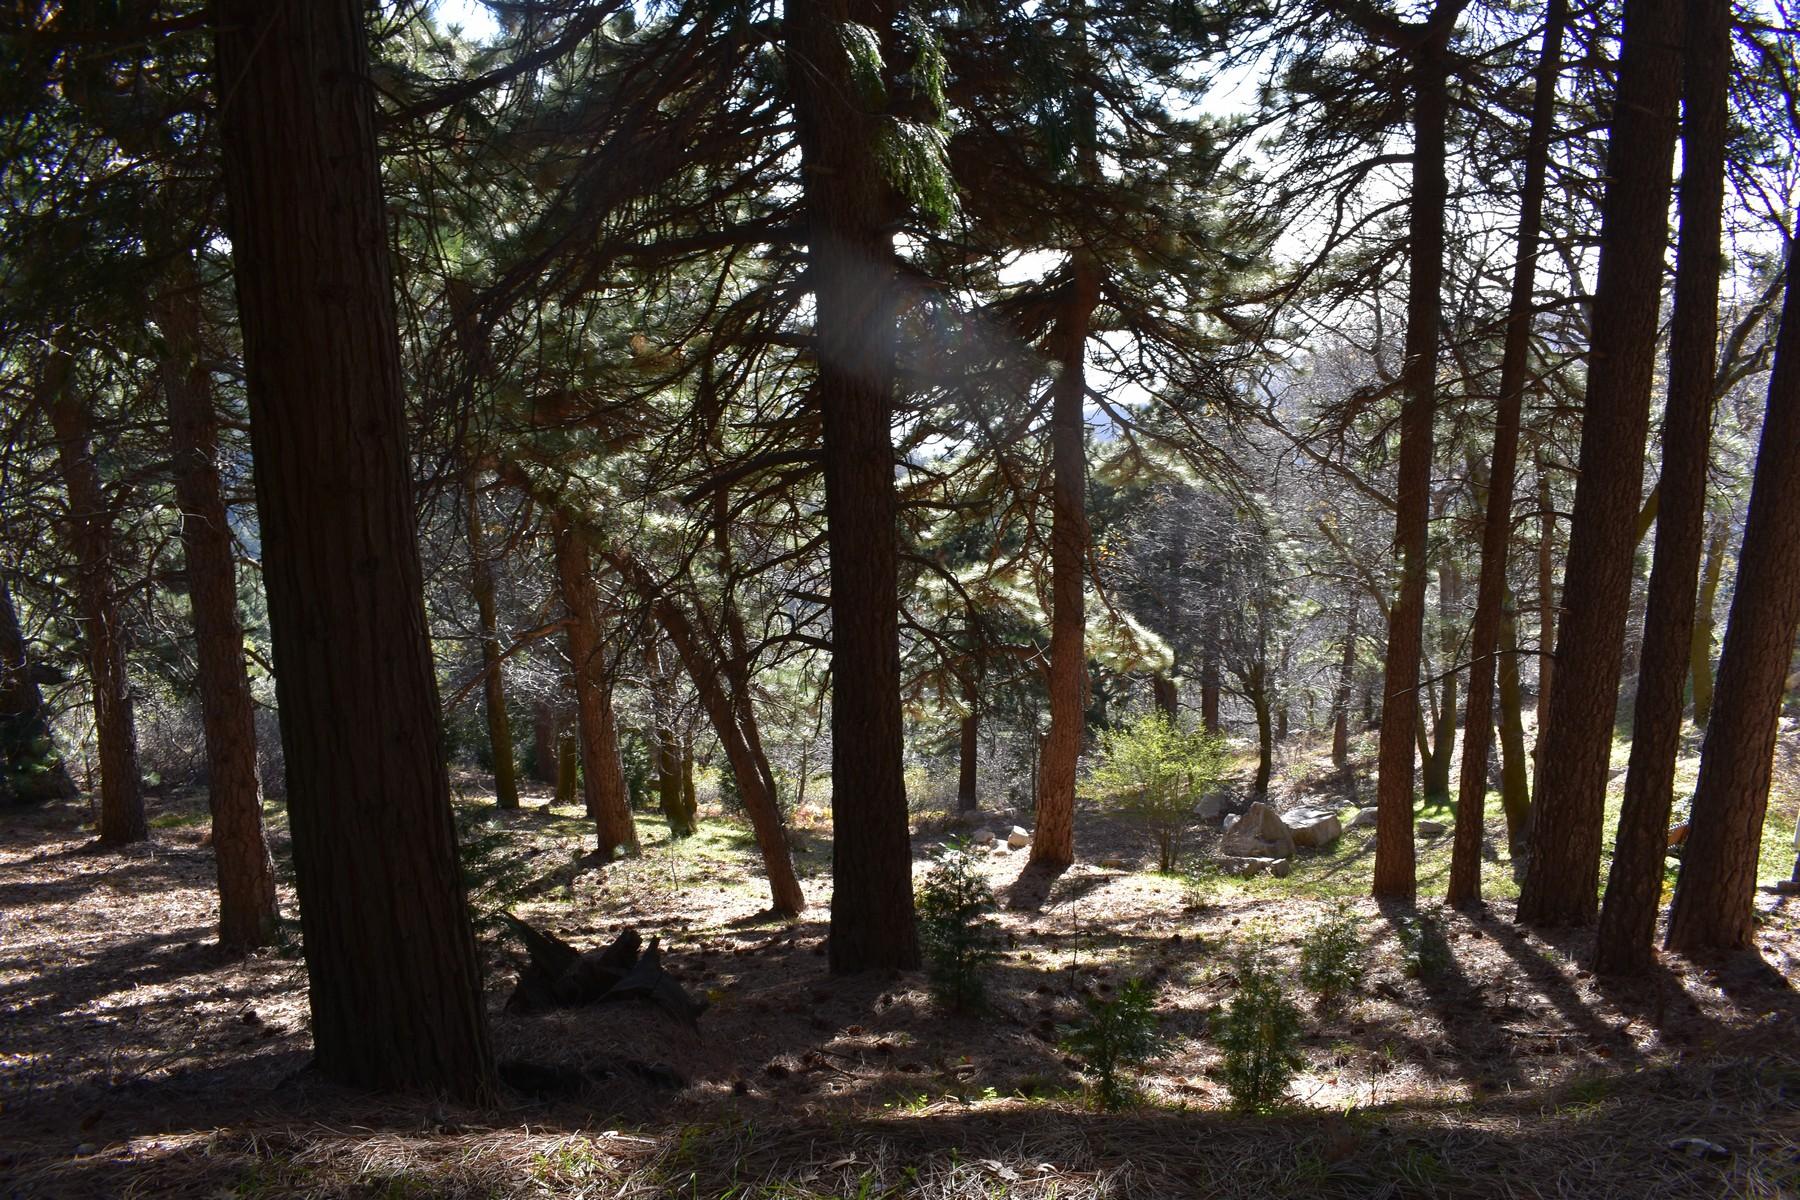 أراضي للـ Sale في Grass Valley Alley, Lake Arrowhead, California, 92352 Lake Arrowhead, California, 92352 United States